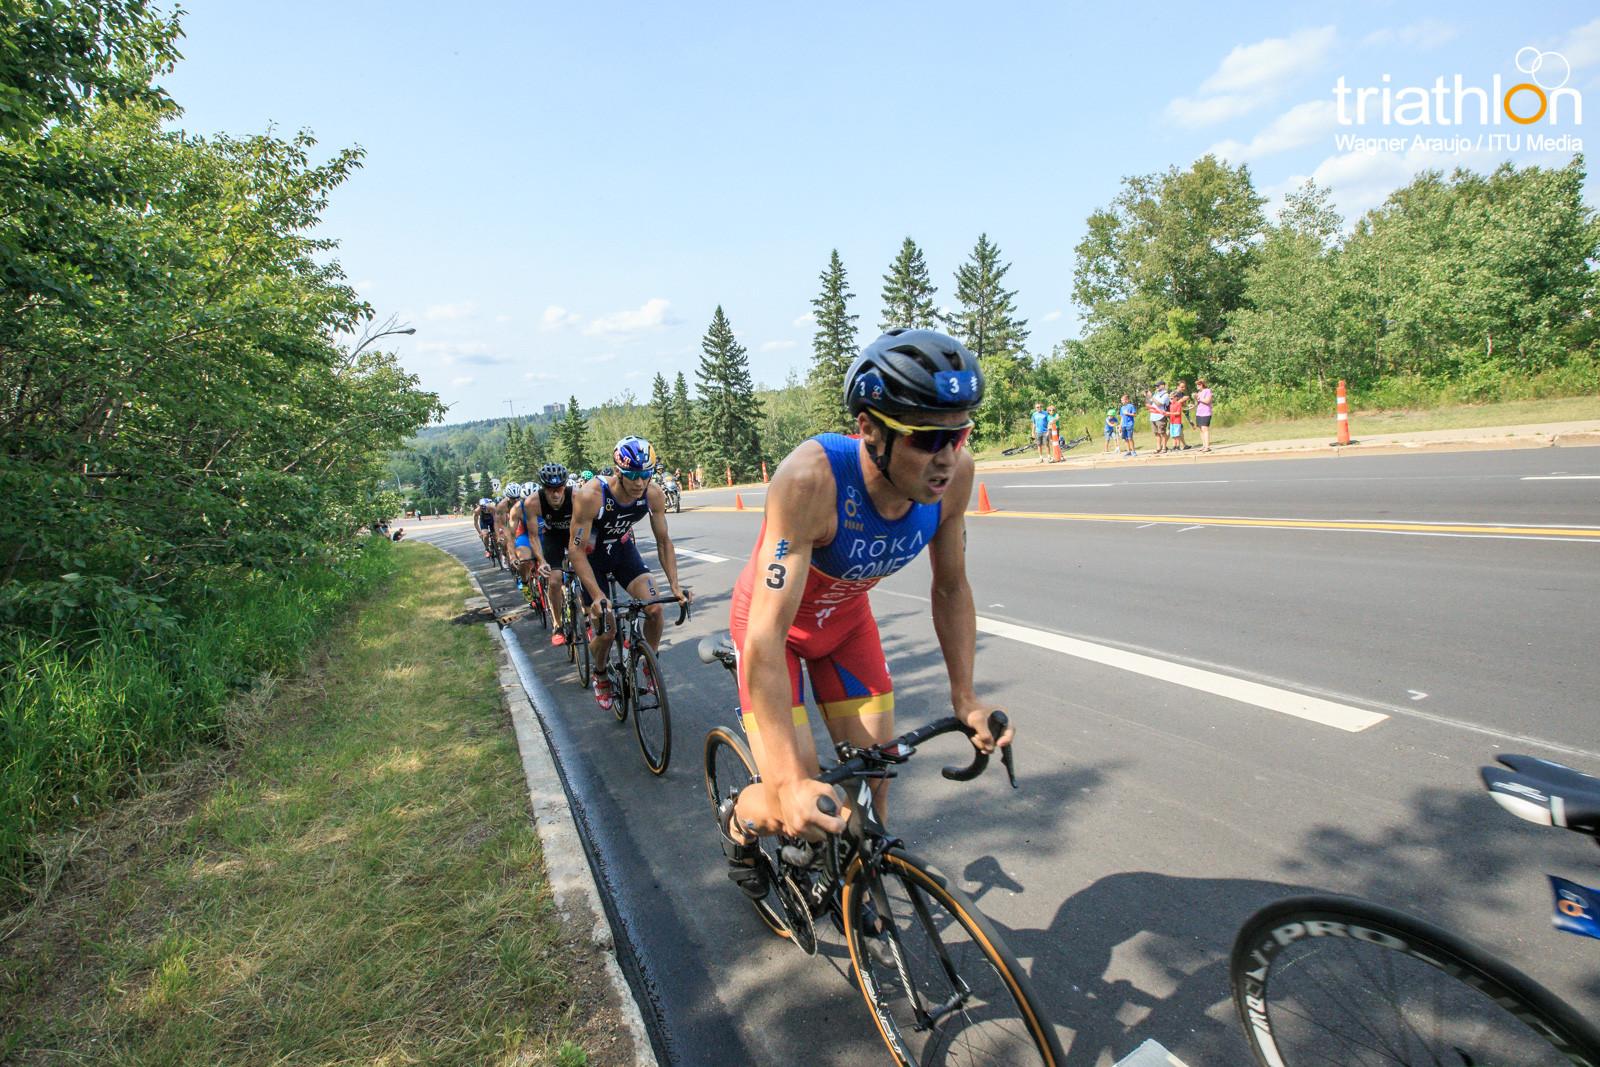 WTS Edmonton mężczyźni rower.jpg